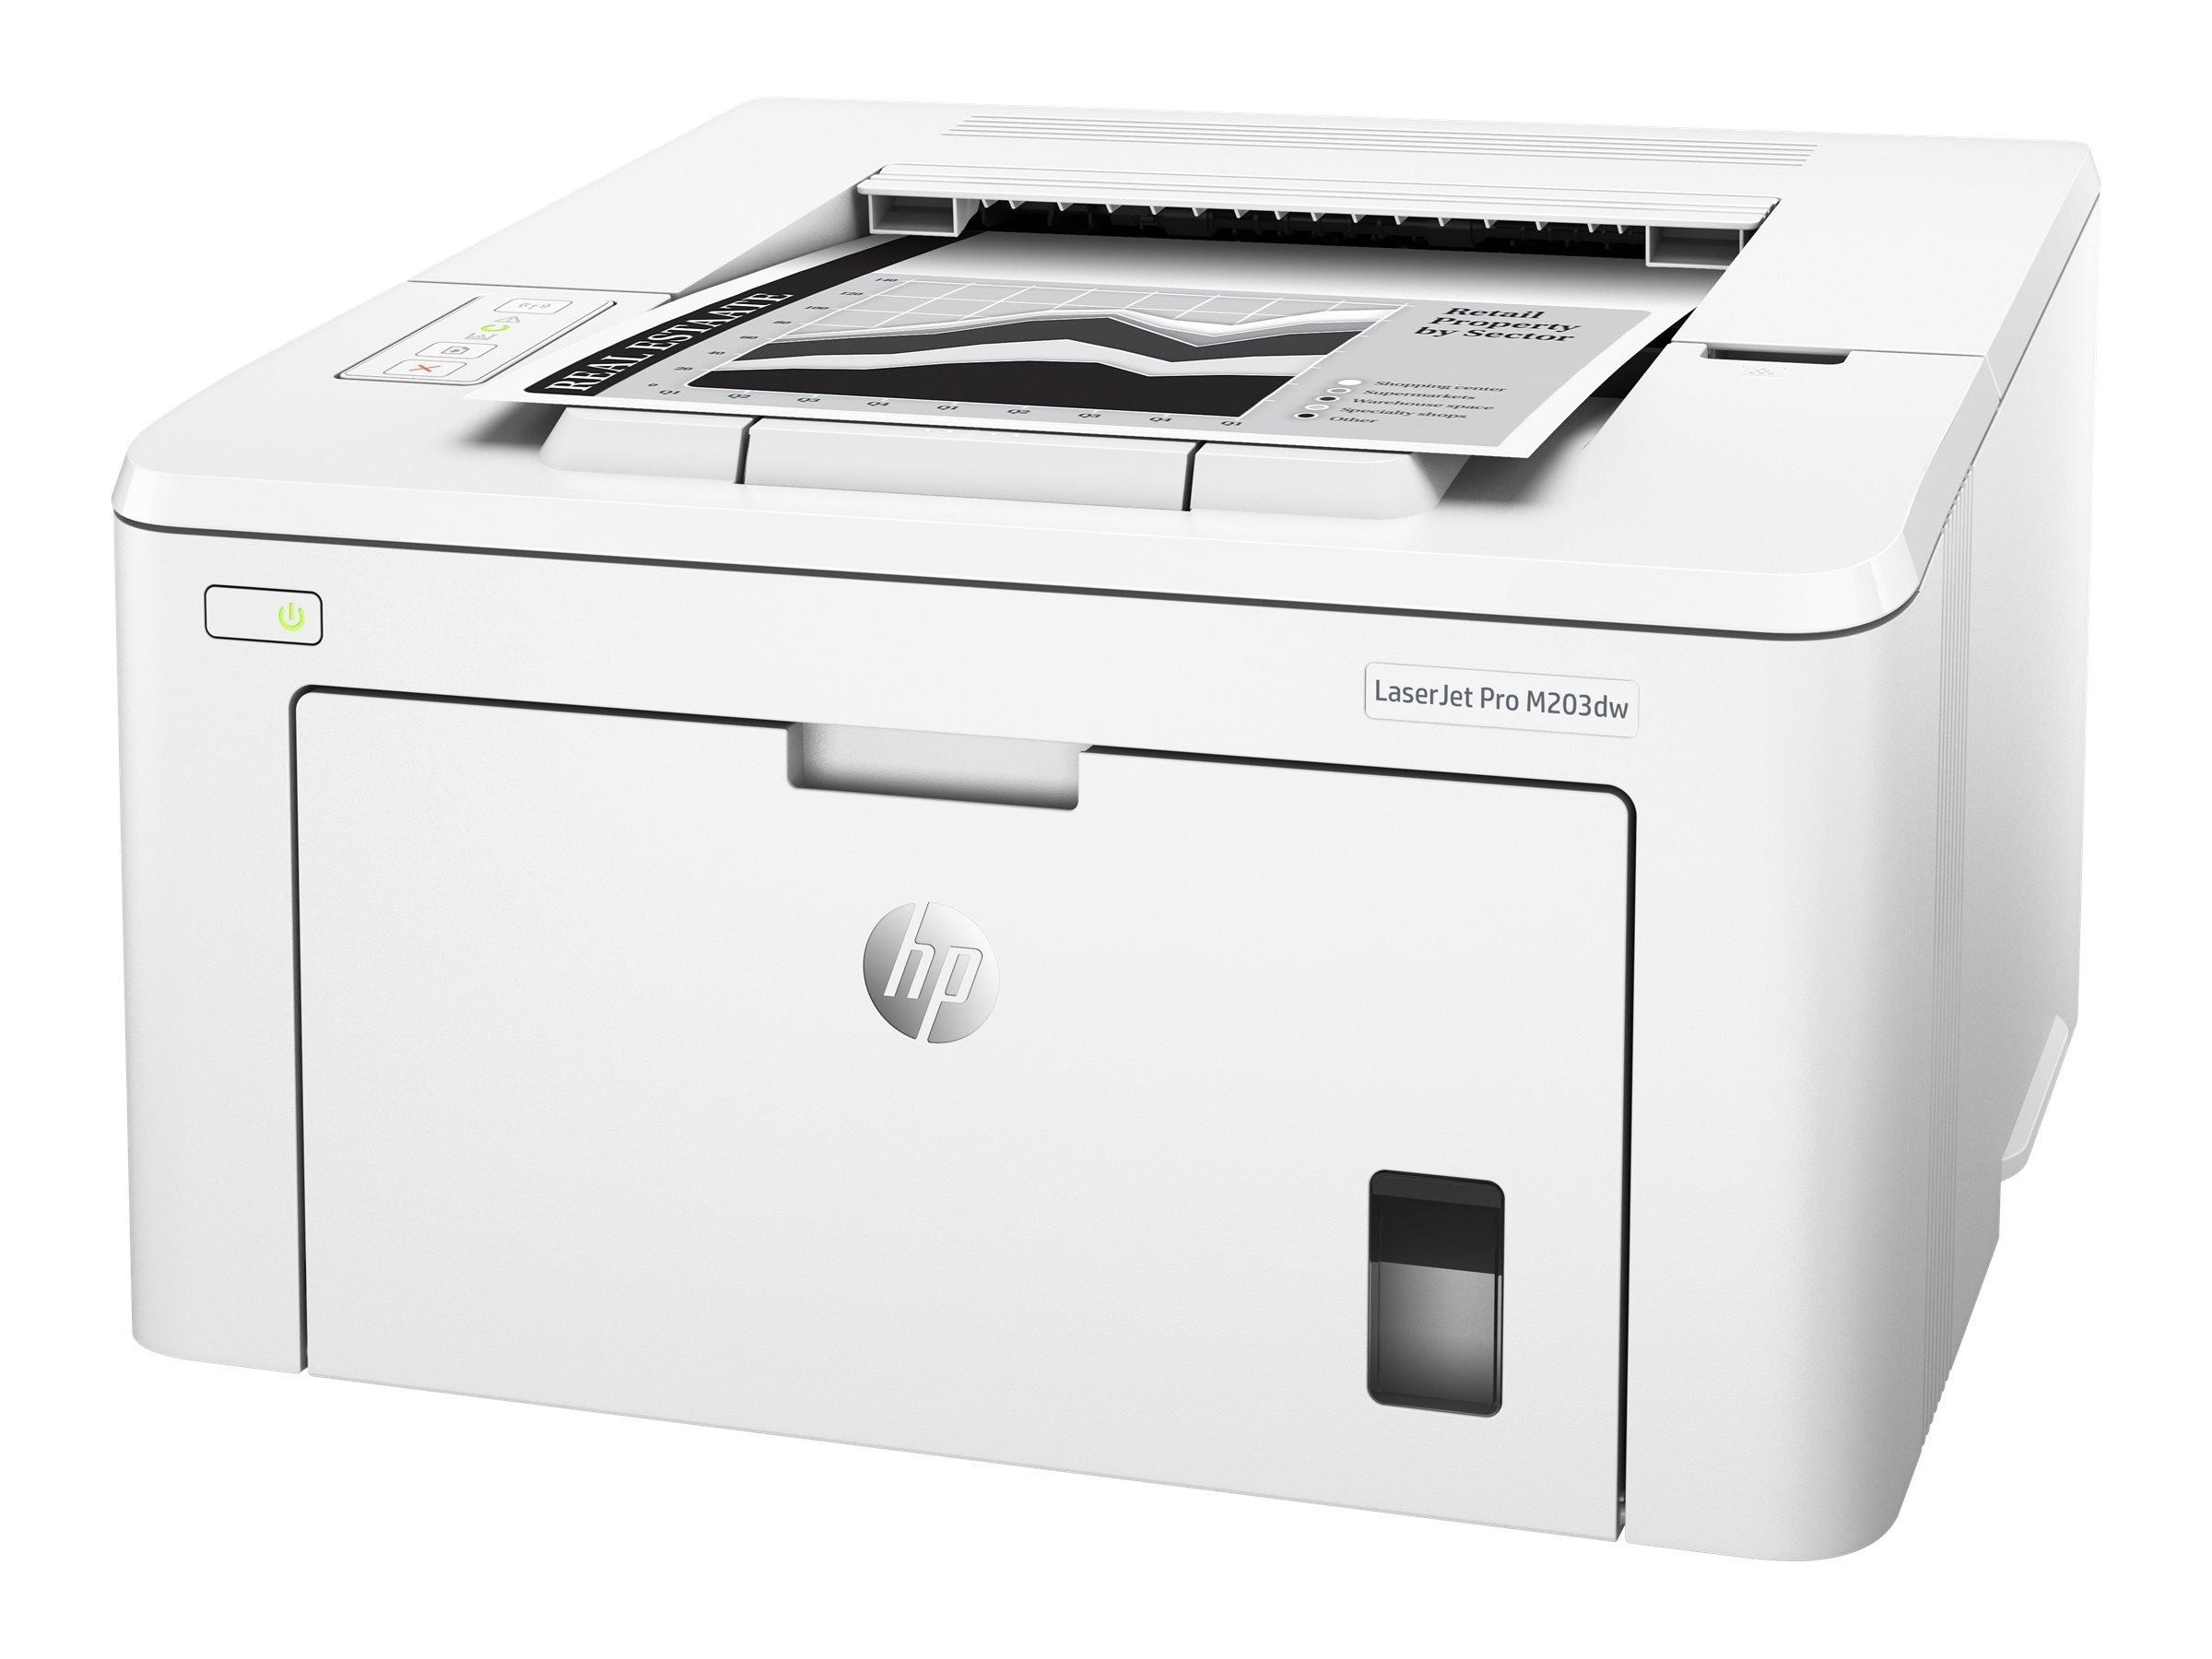 HP G3Q47A#BGJ LaserJet Pro M203dw Wireless Laser Printer (G3Q47A). Replaces M201dw Laser Printer (Certified Refurbished)